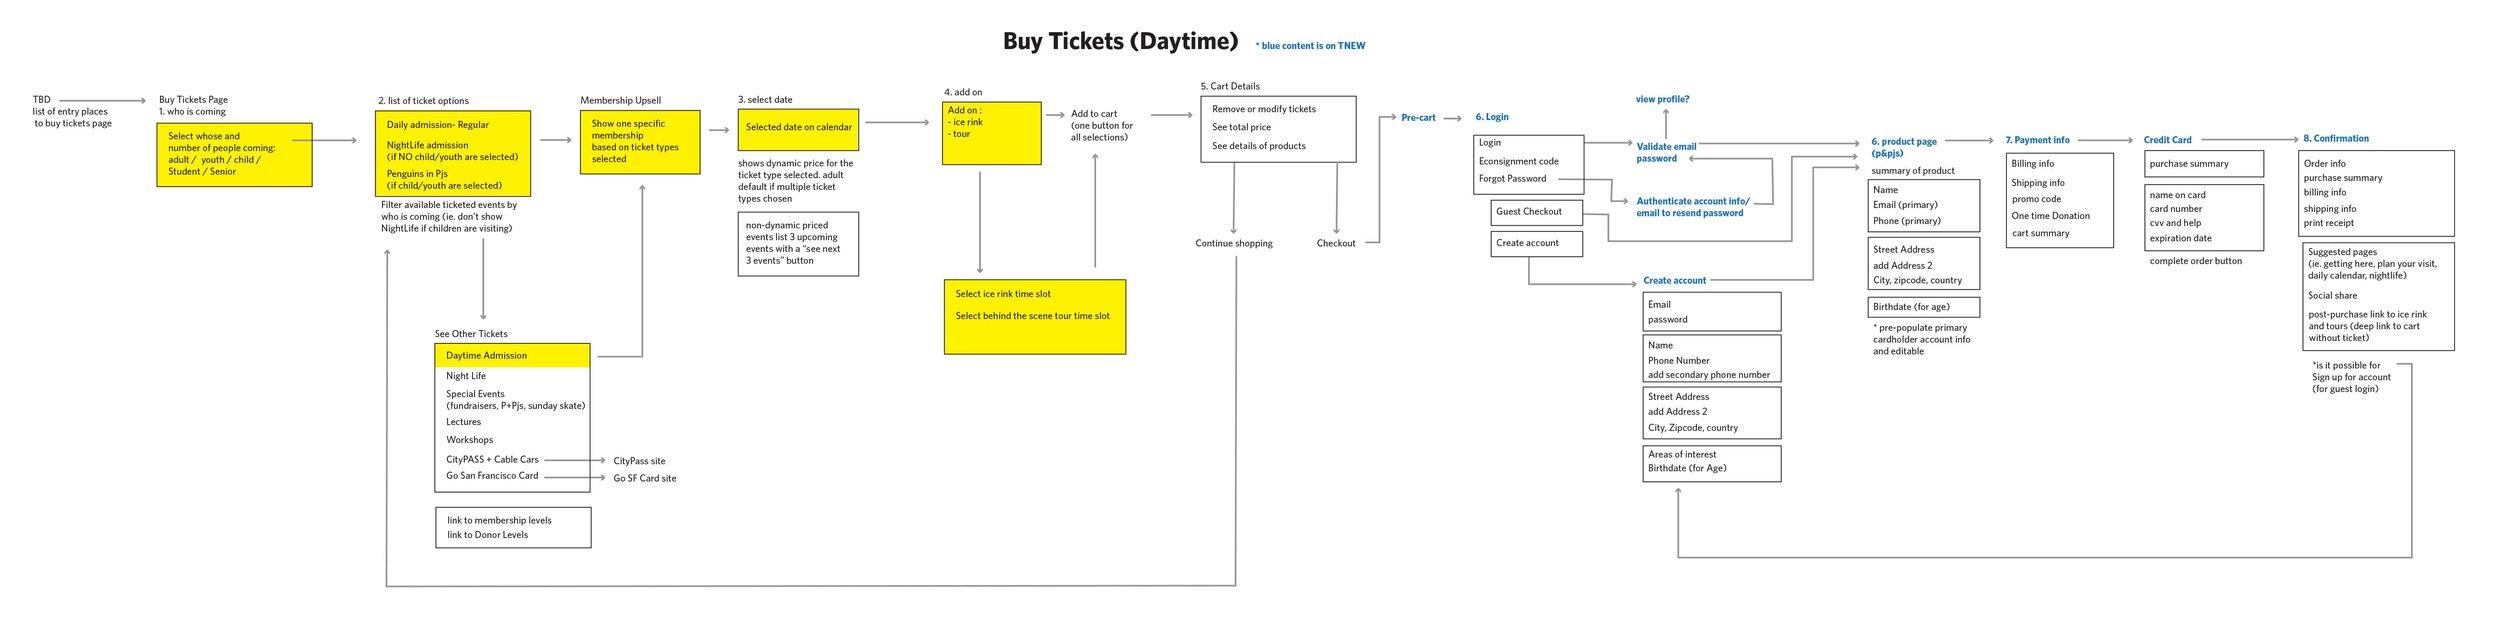 012919_cart-flowchart-buytickets-1.jpg